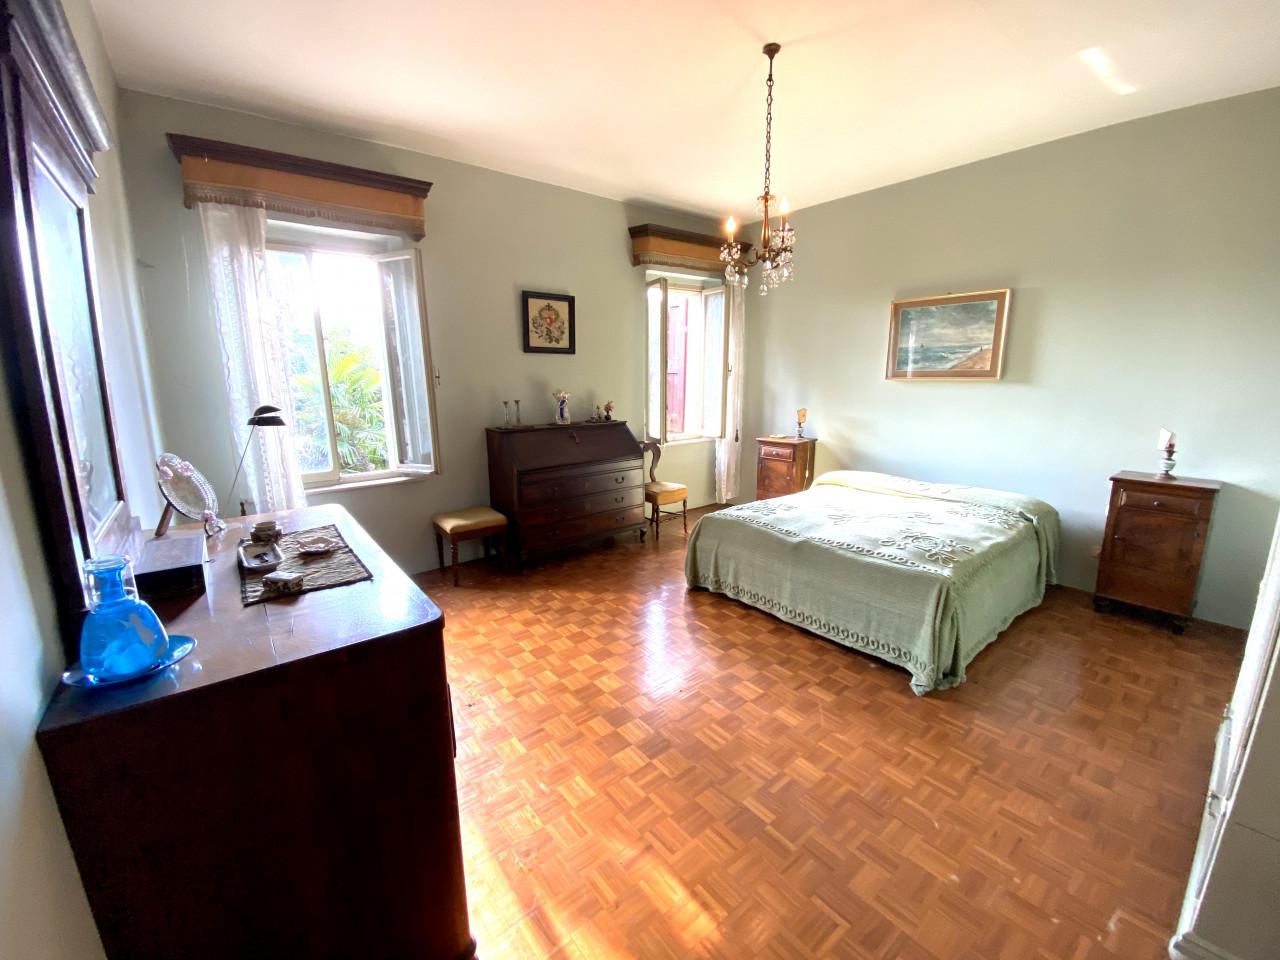 Dimora Storica in vendita in Centro a Valvasone - Rif.P1 https://images.gestionaleimmobiliare.it/foto/annunci/200820/2282895/1280x1280/013__img_3566.jpg